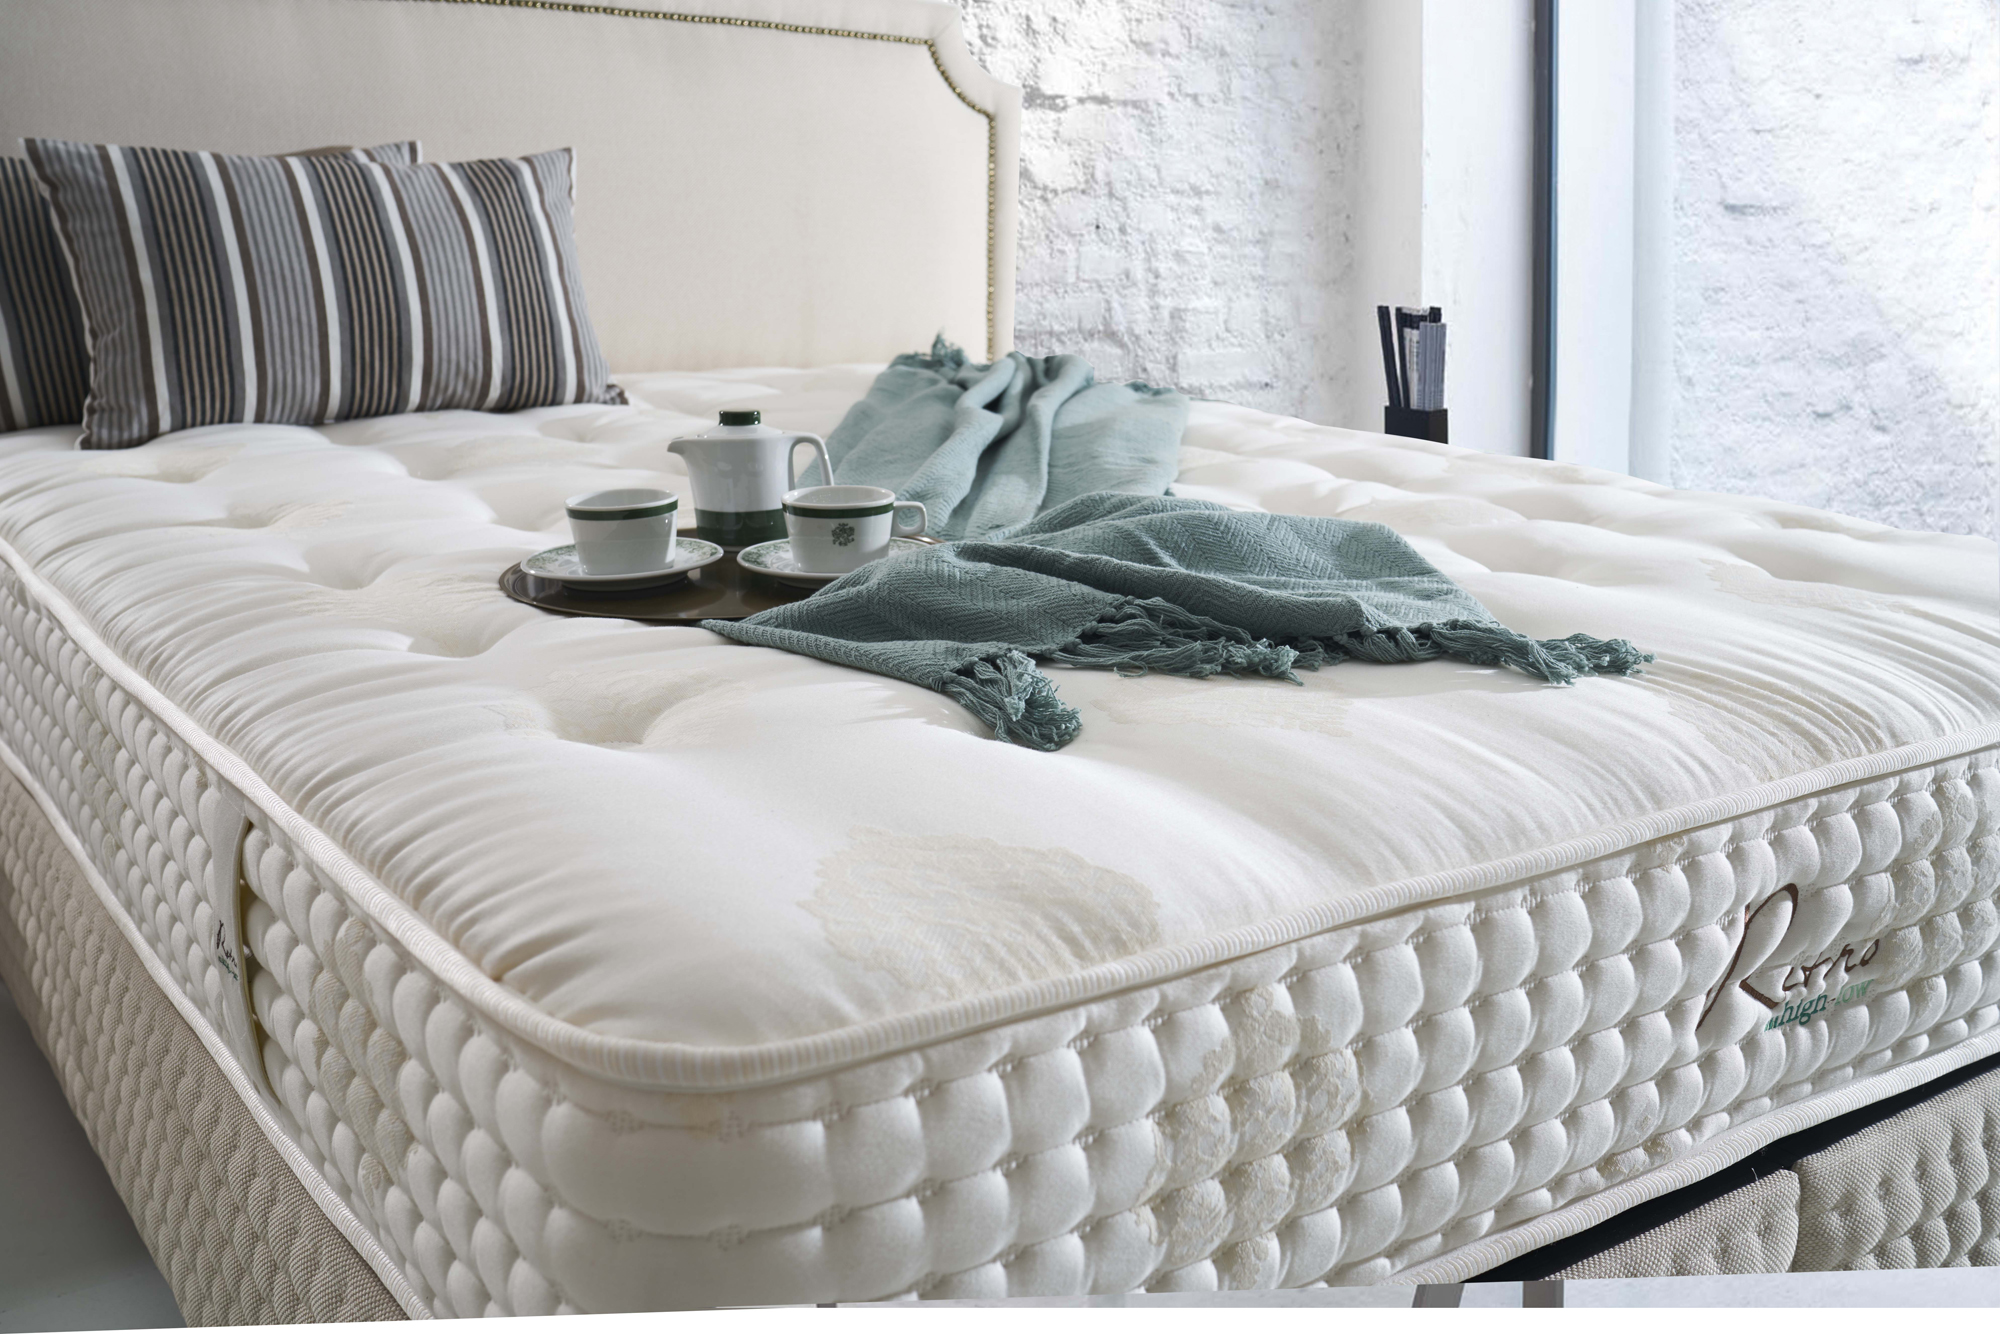 retro matratze yuvam m belhaus in wuppertal cilek offizieller h ndler in europa. Black Bedroom Furniture Sets. Home Design Ideas